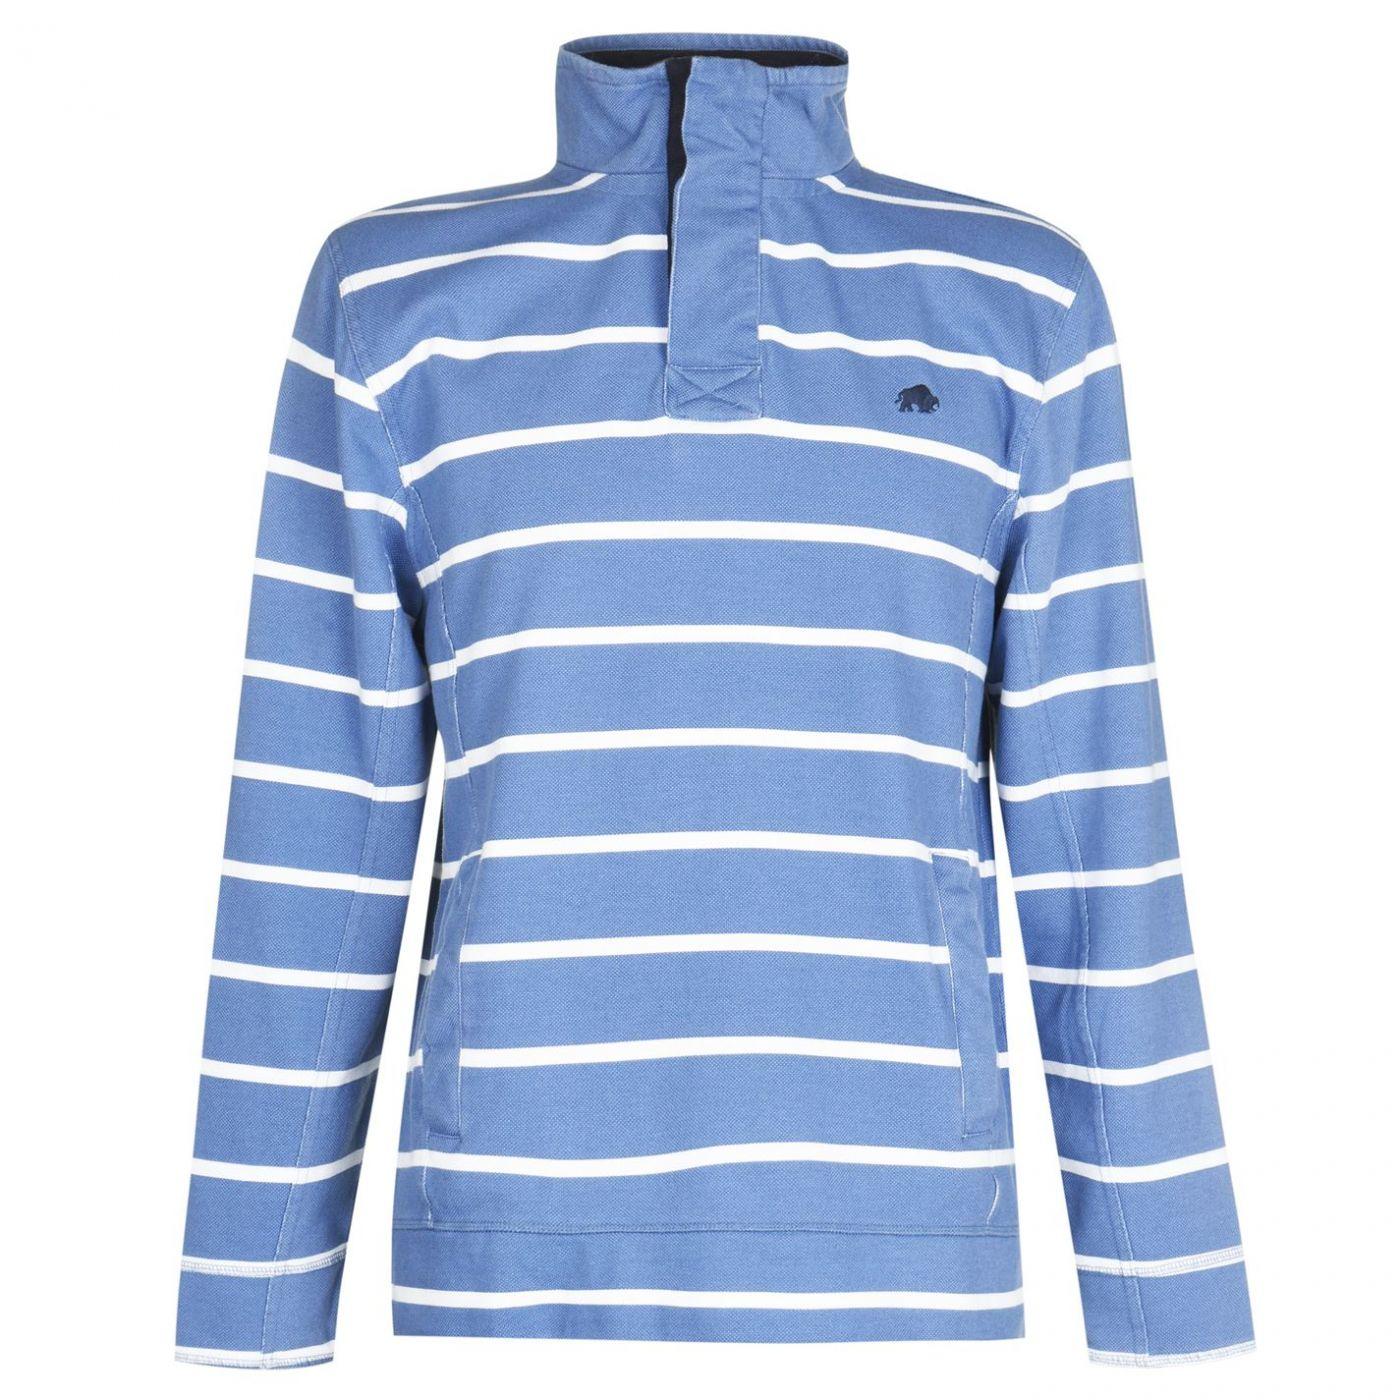 Raging Bull Stripe Zip Sweatshirt